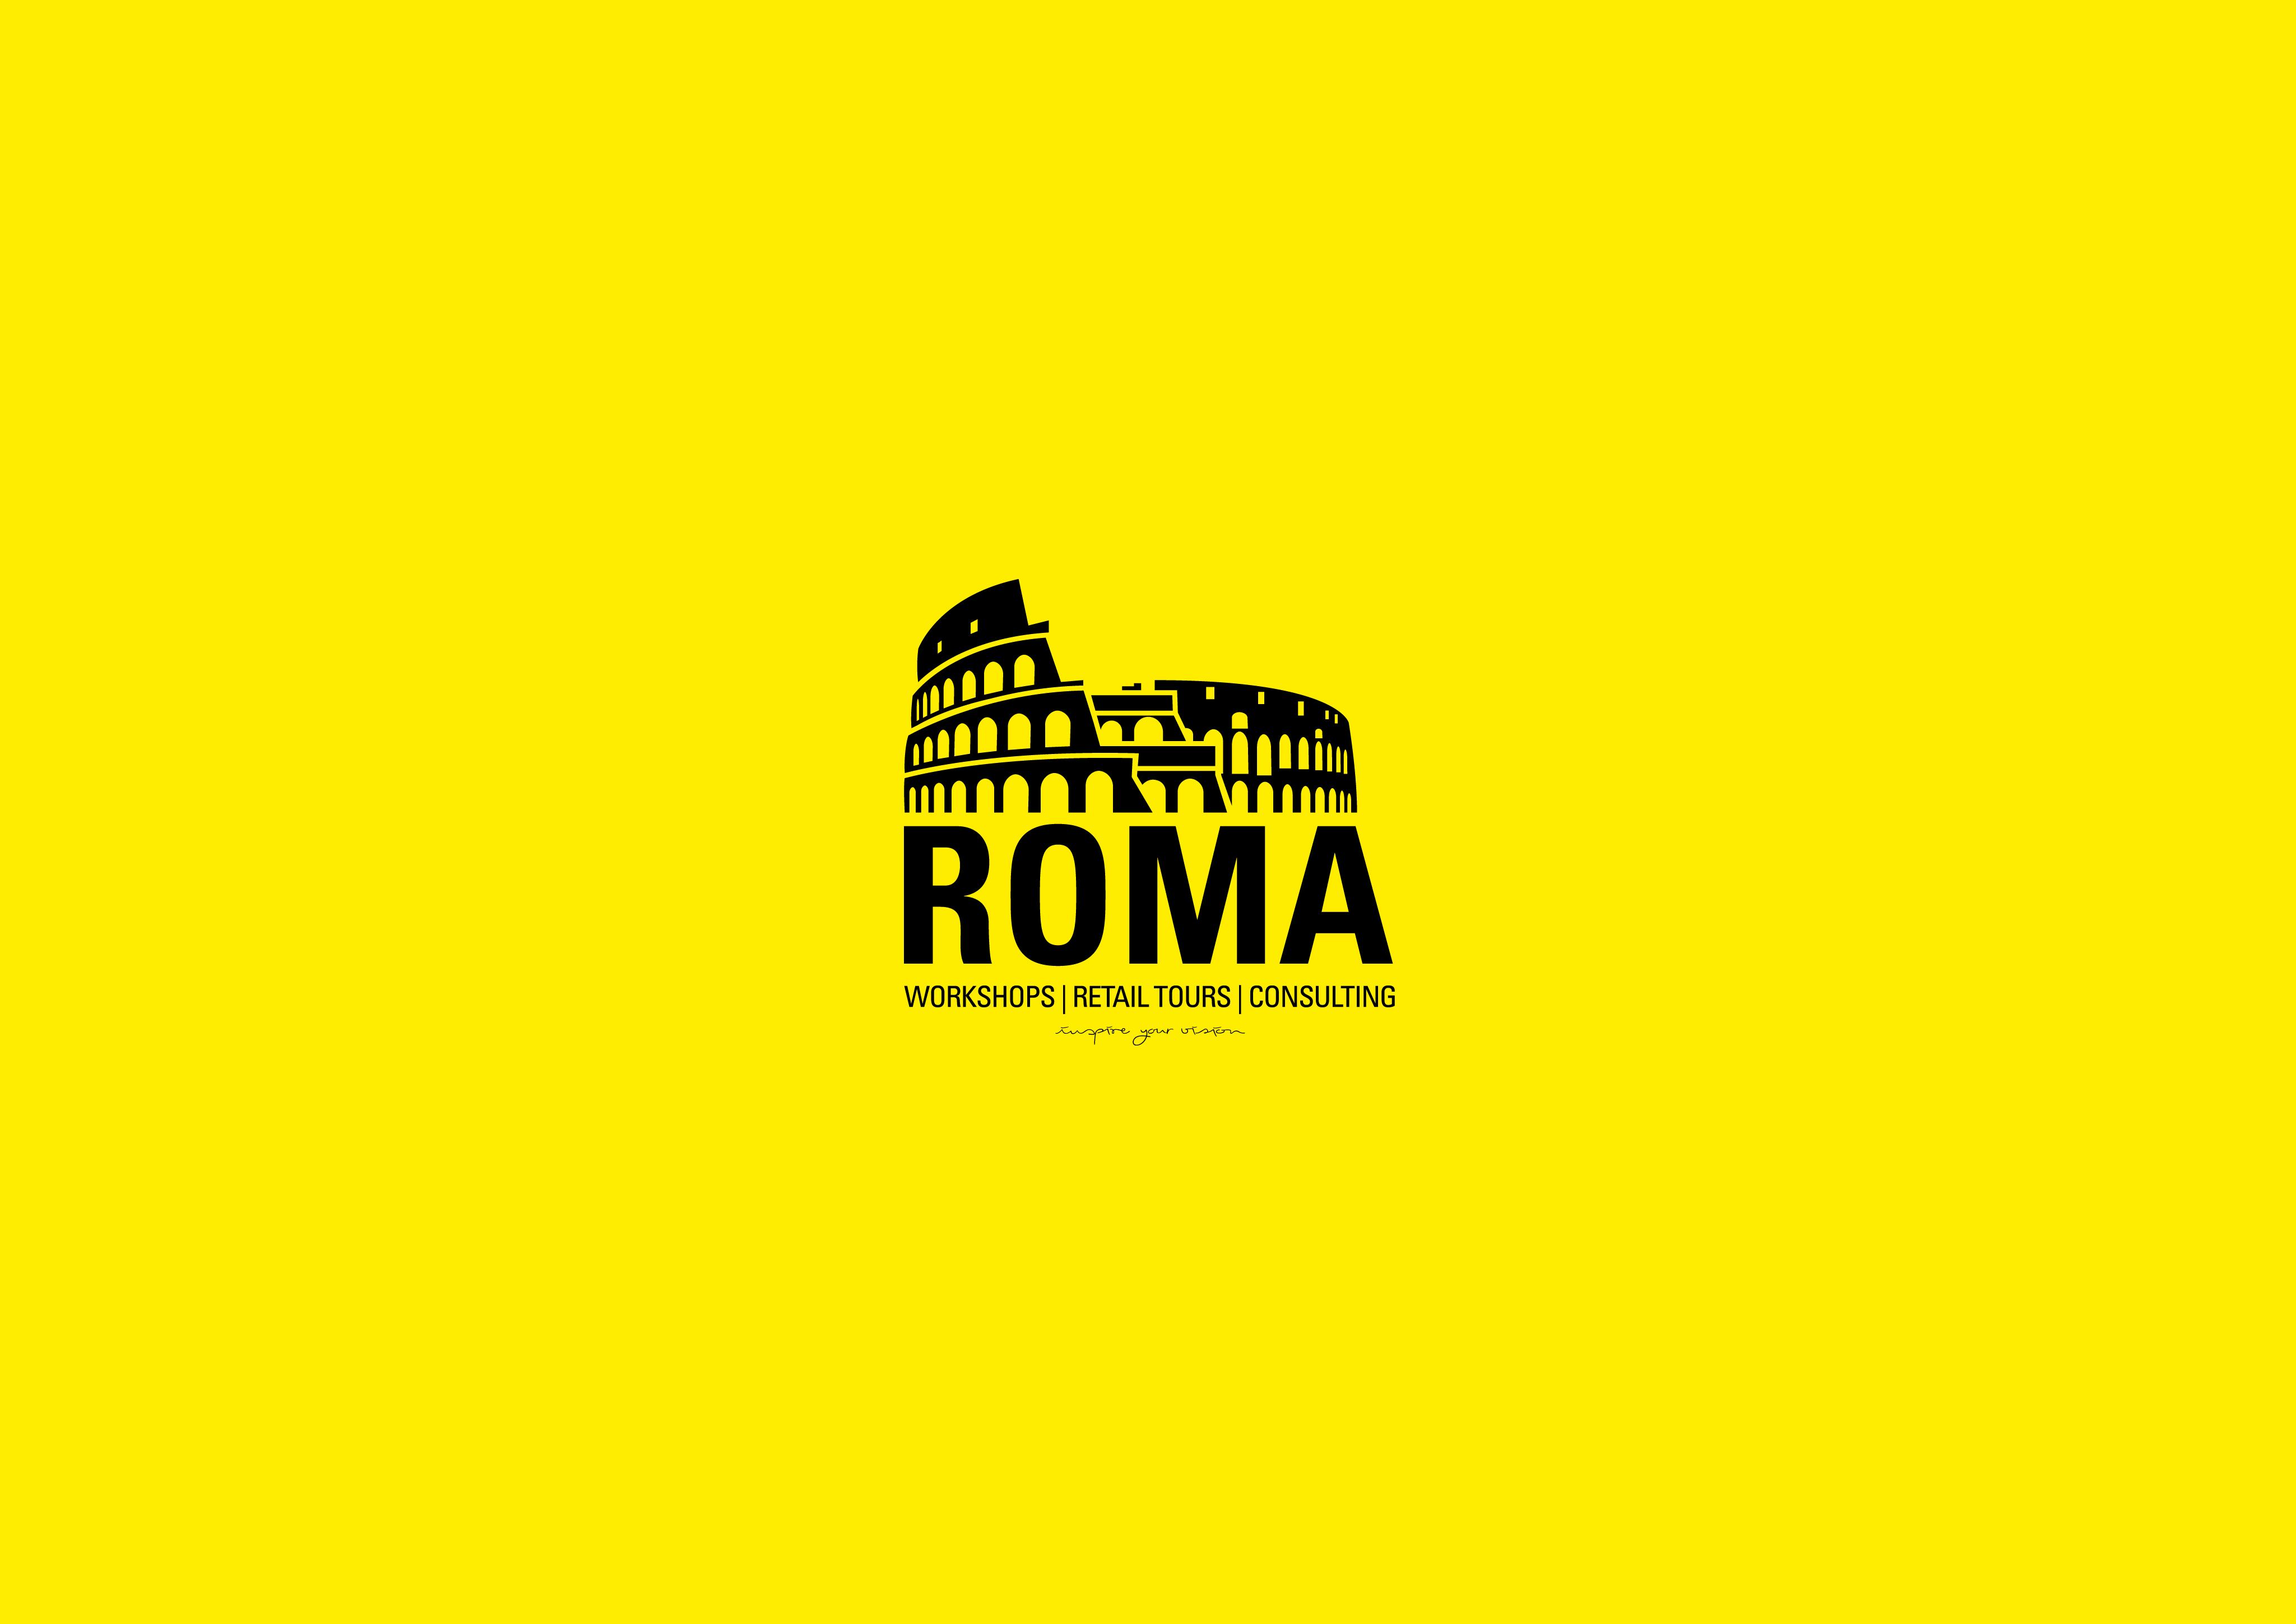 YC_ROMA